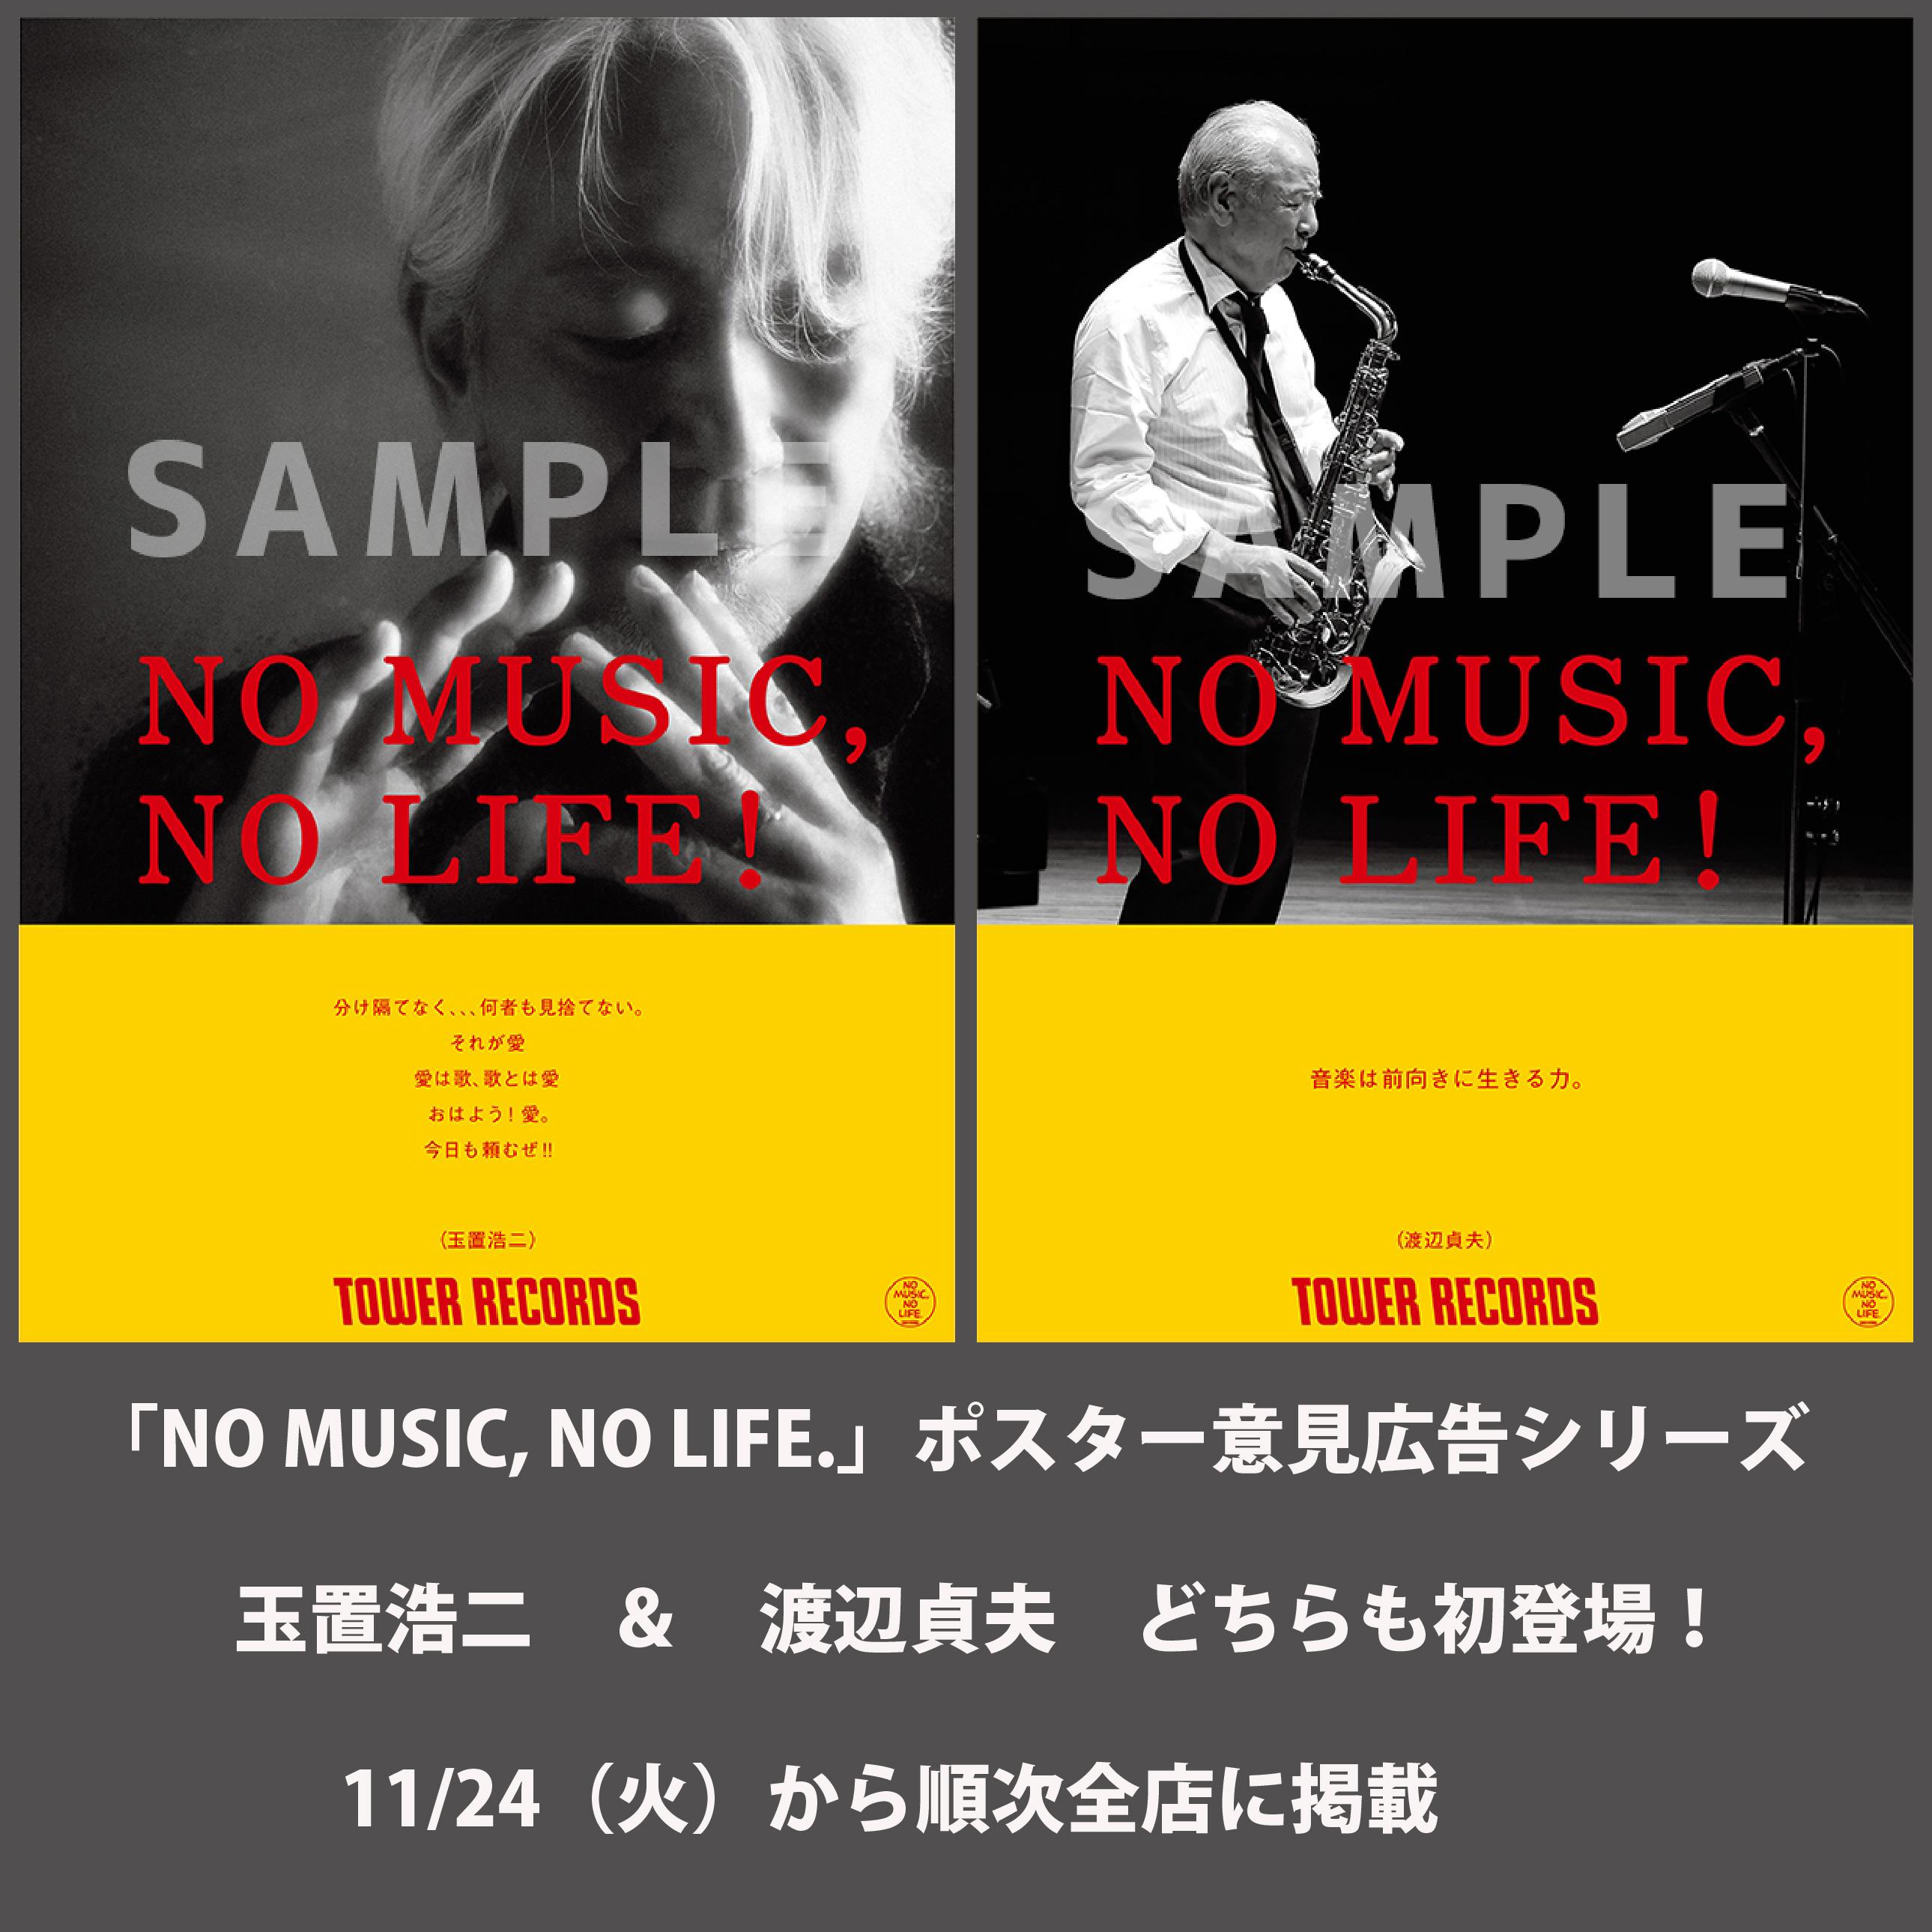 「NO MUSIC, NO LIFE.」ポスター意見広告シリーズに 玉置浩二と渡辺貞夫がそれぞれ初登場!~11月24日(火)より掲出開始〜